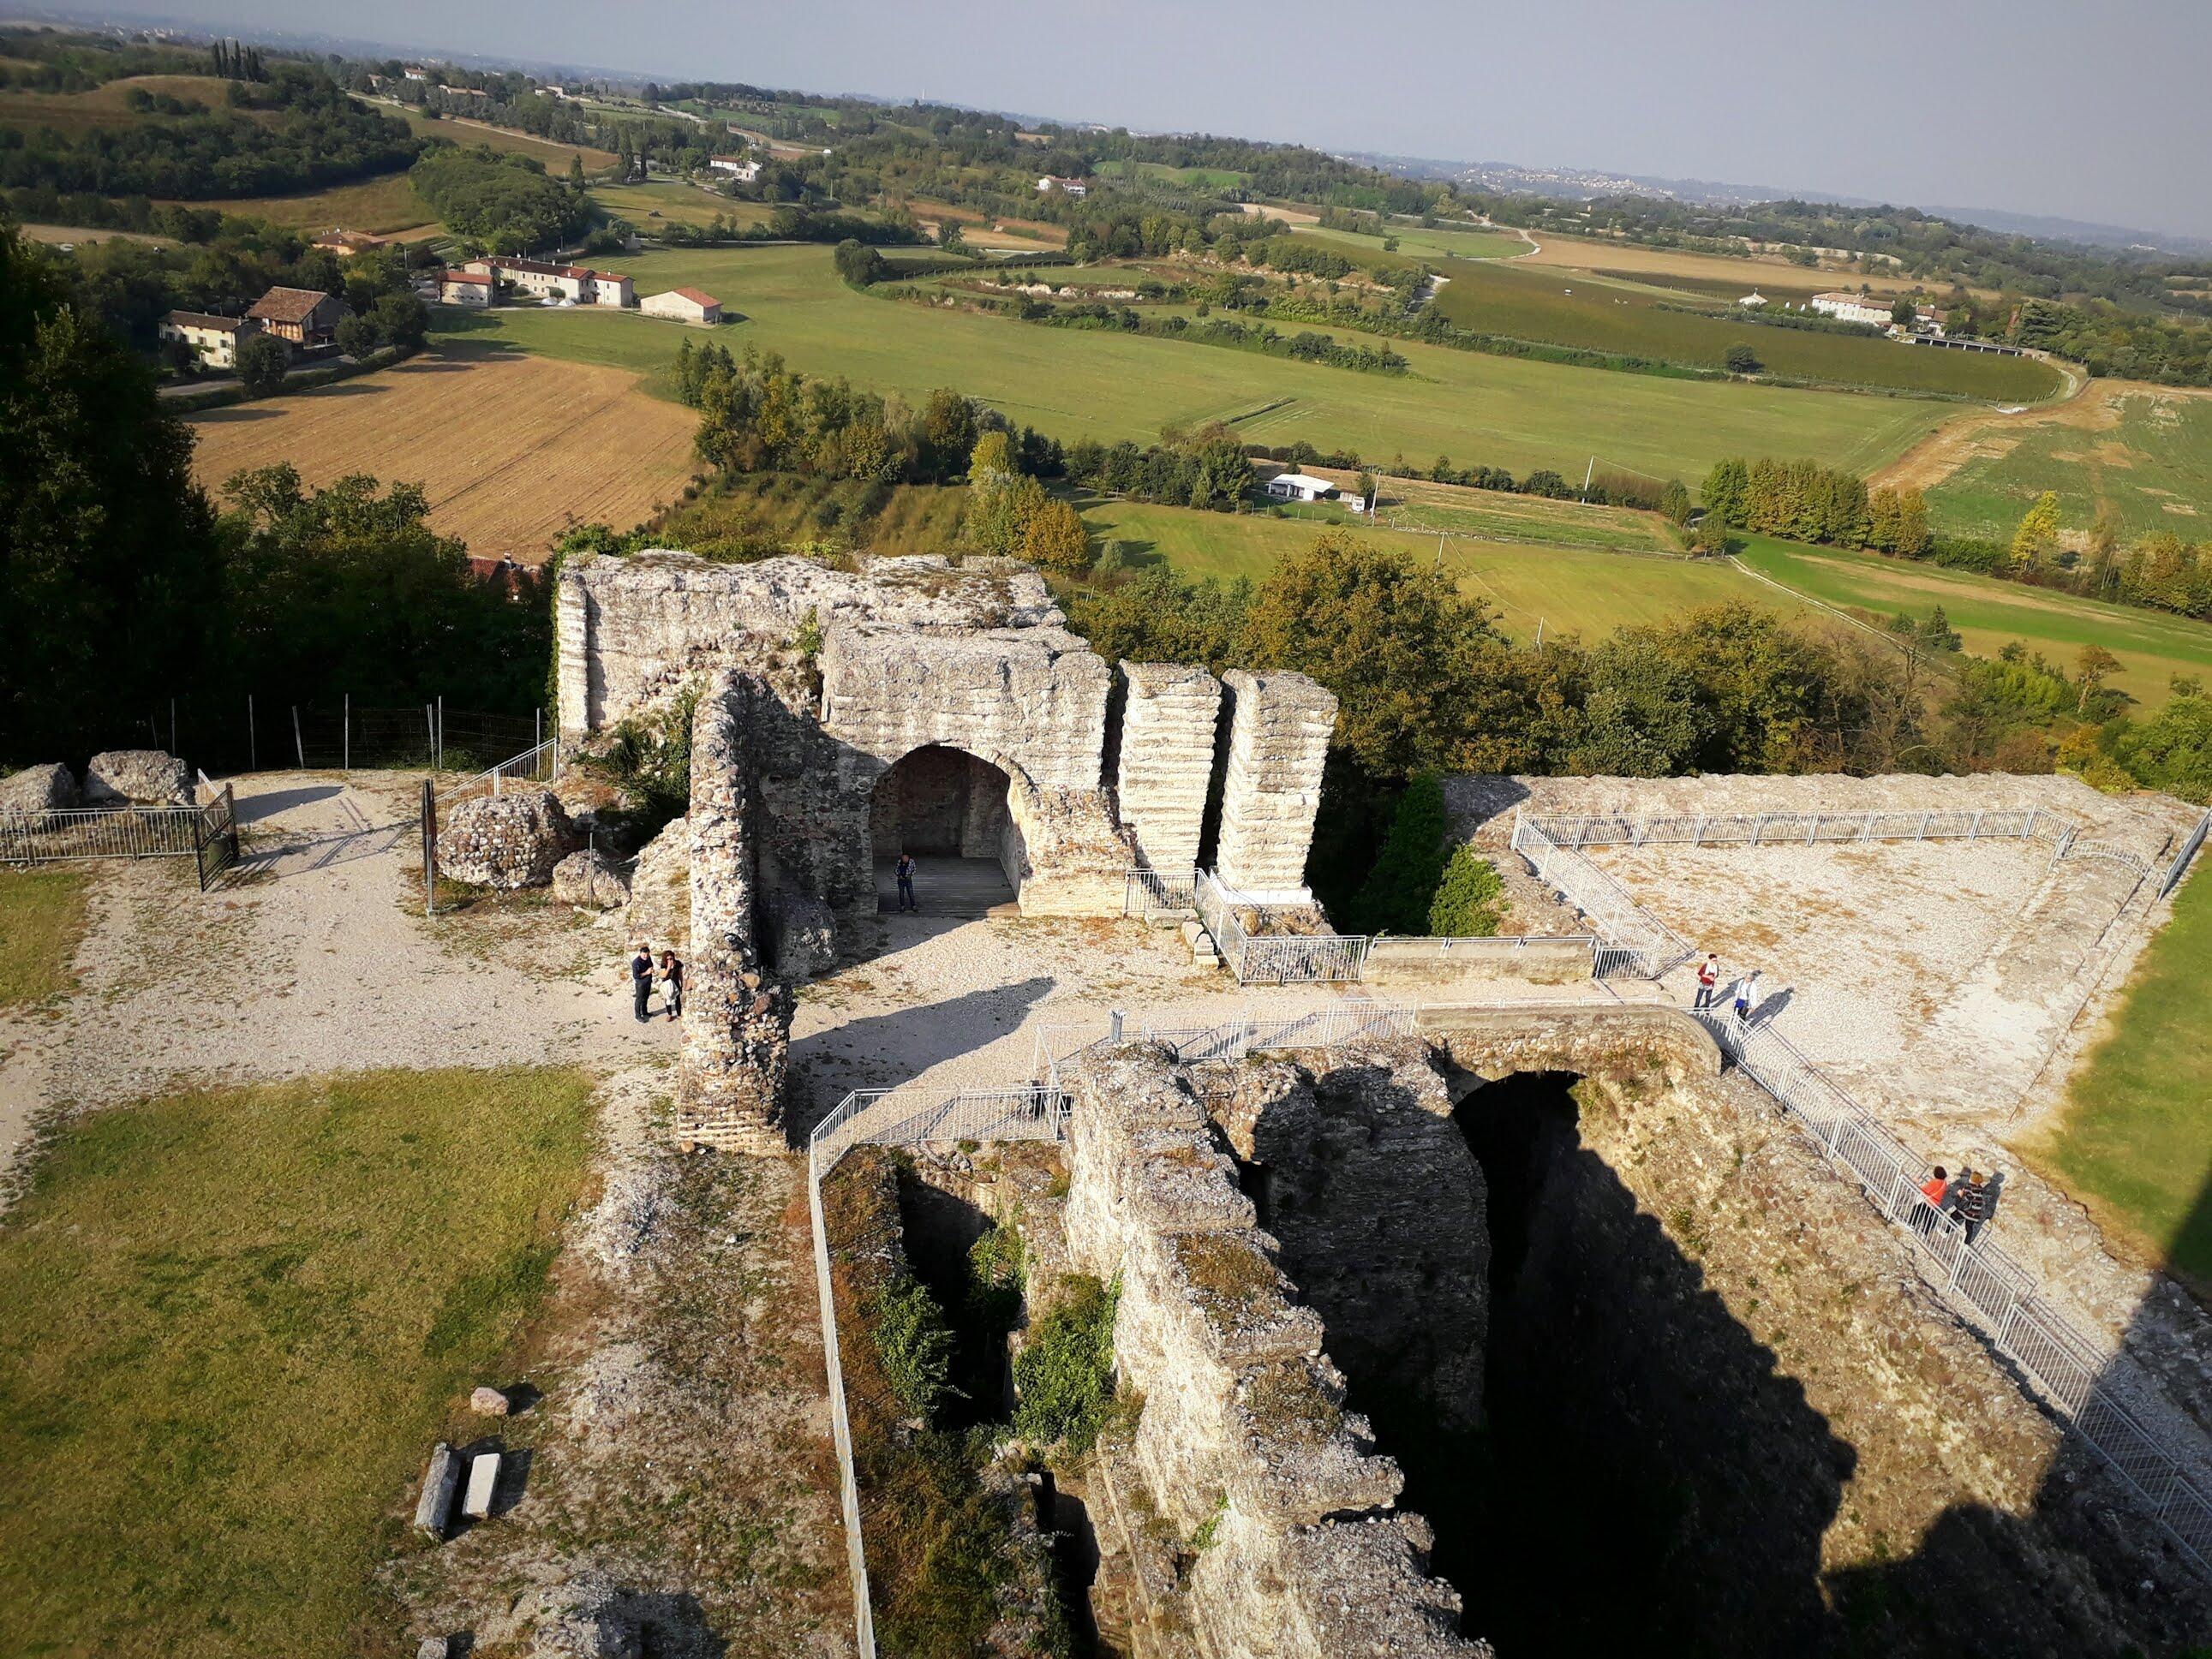 Cavriana castello panoramica